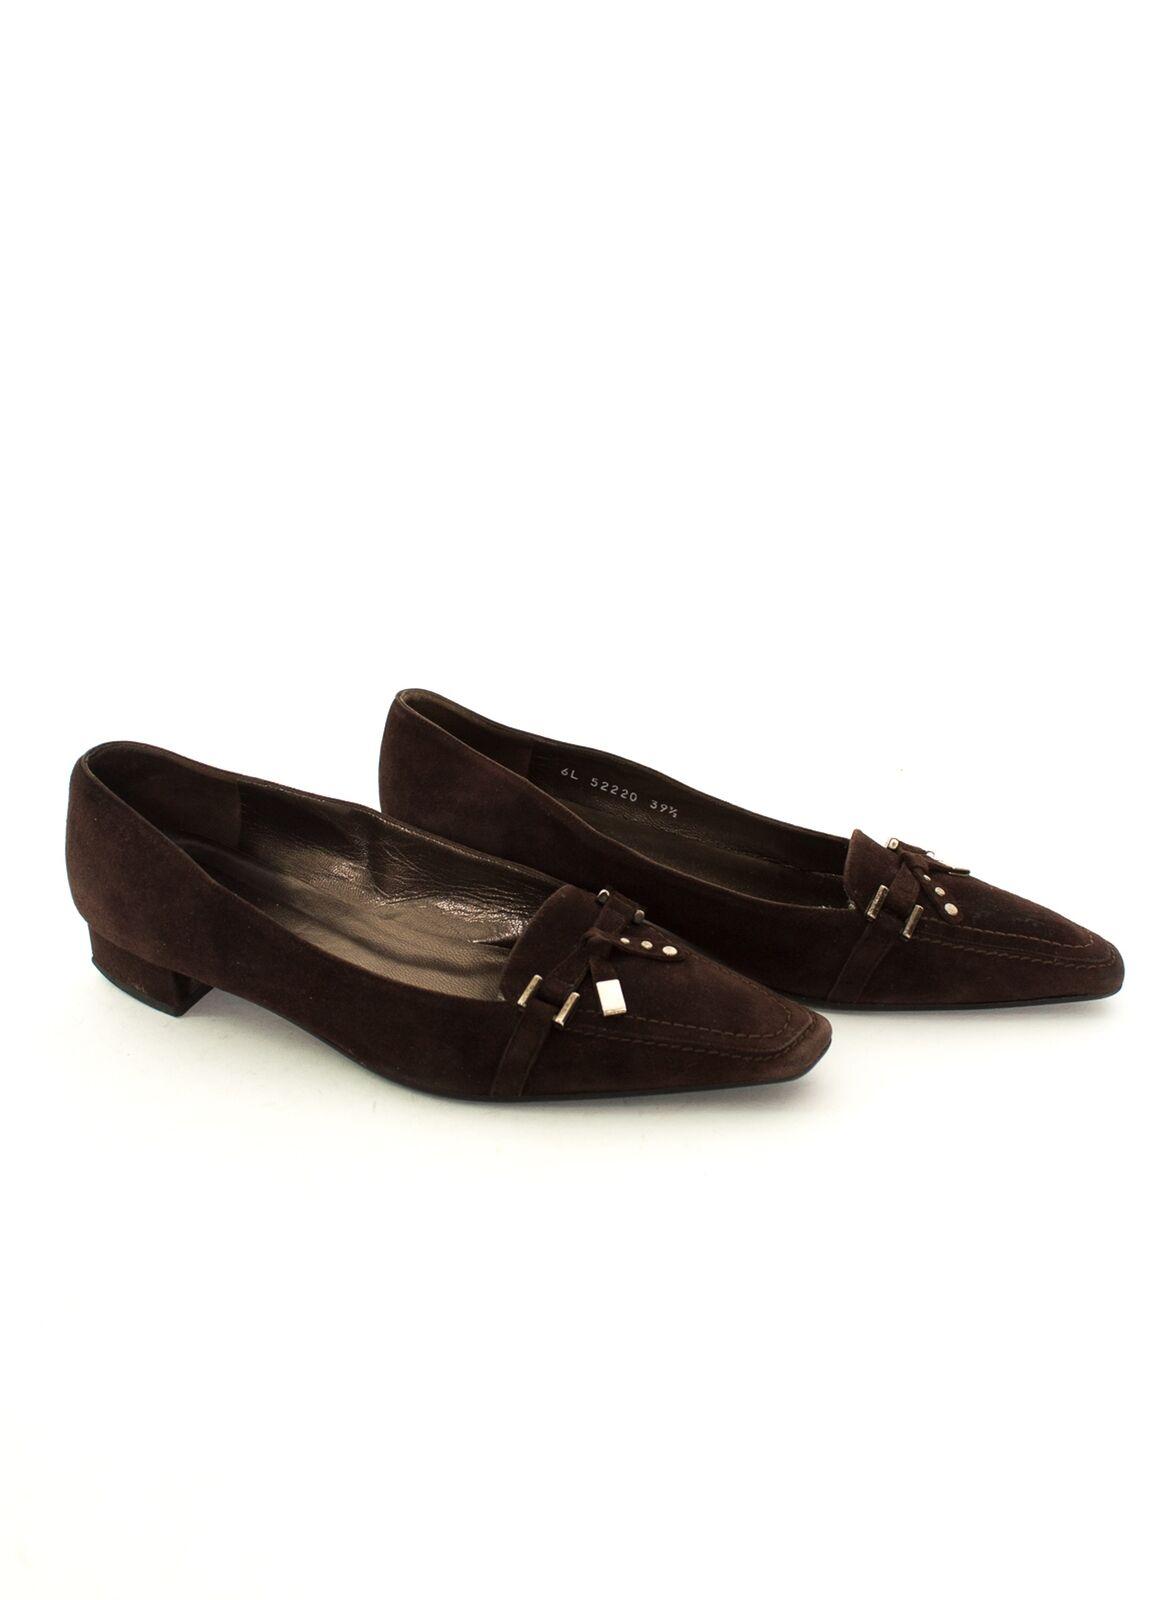 STUART WEITZMAN WEITZMAN WEITZMAN Pumps Gr. EU 39,5 Damen Schuhe High Heels Laufer Braun Leder  | Neueste Technologie  c15918